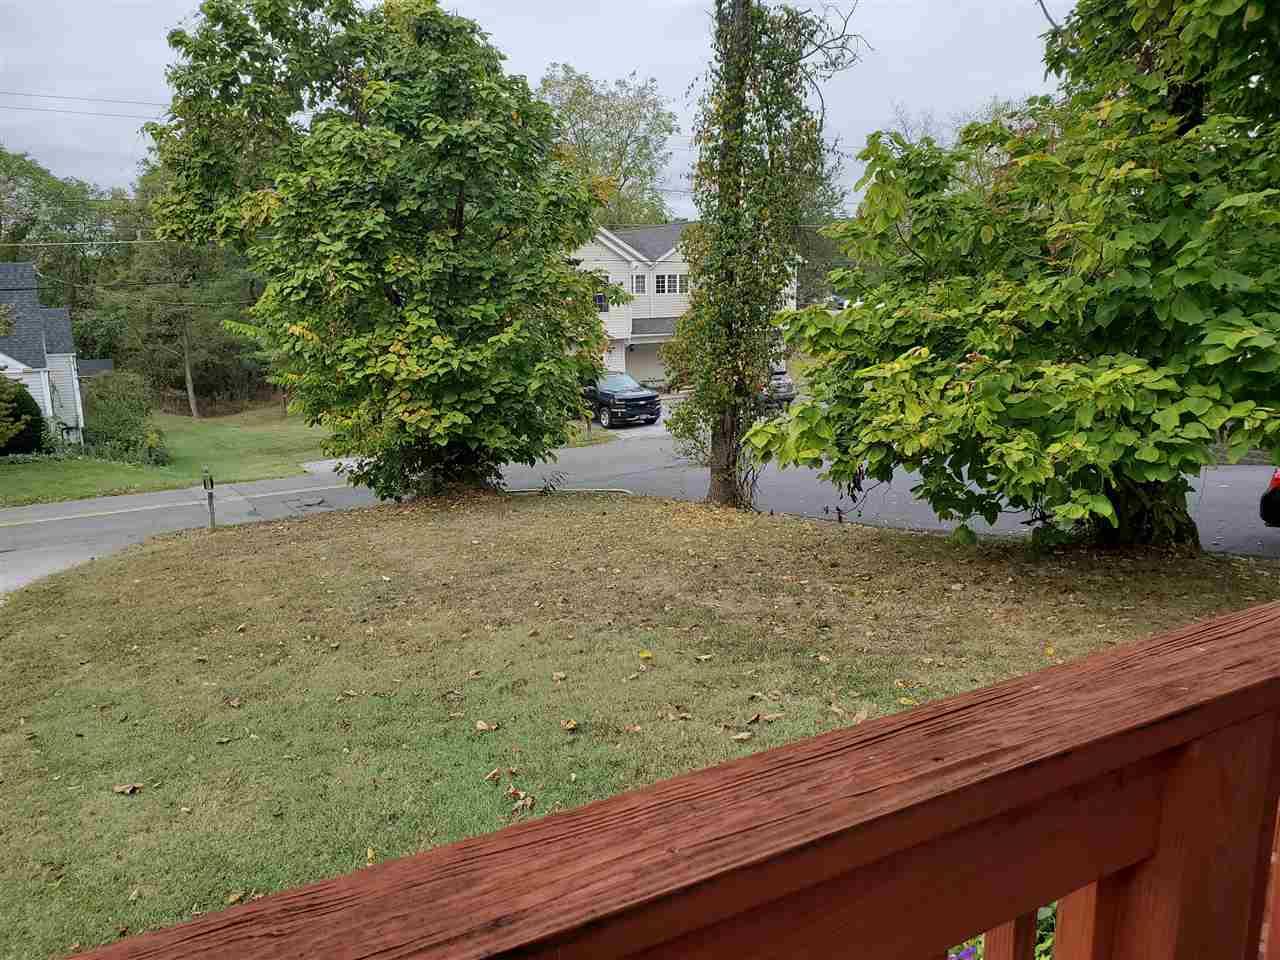 77 Woodlee Rd, Staunton, VA, 24401